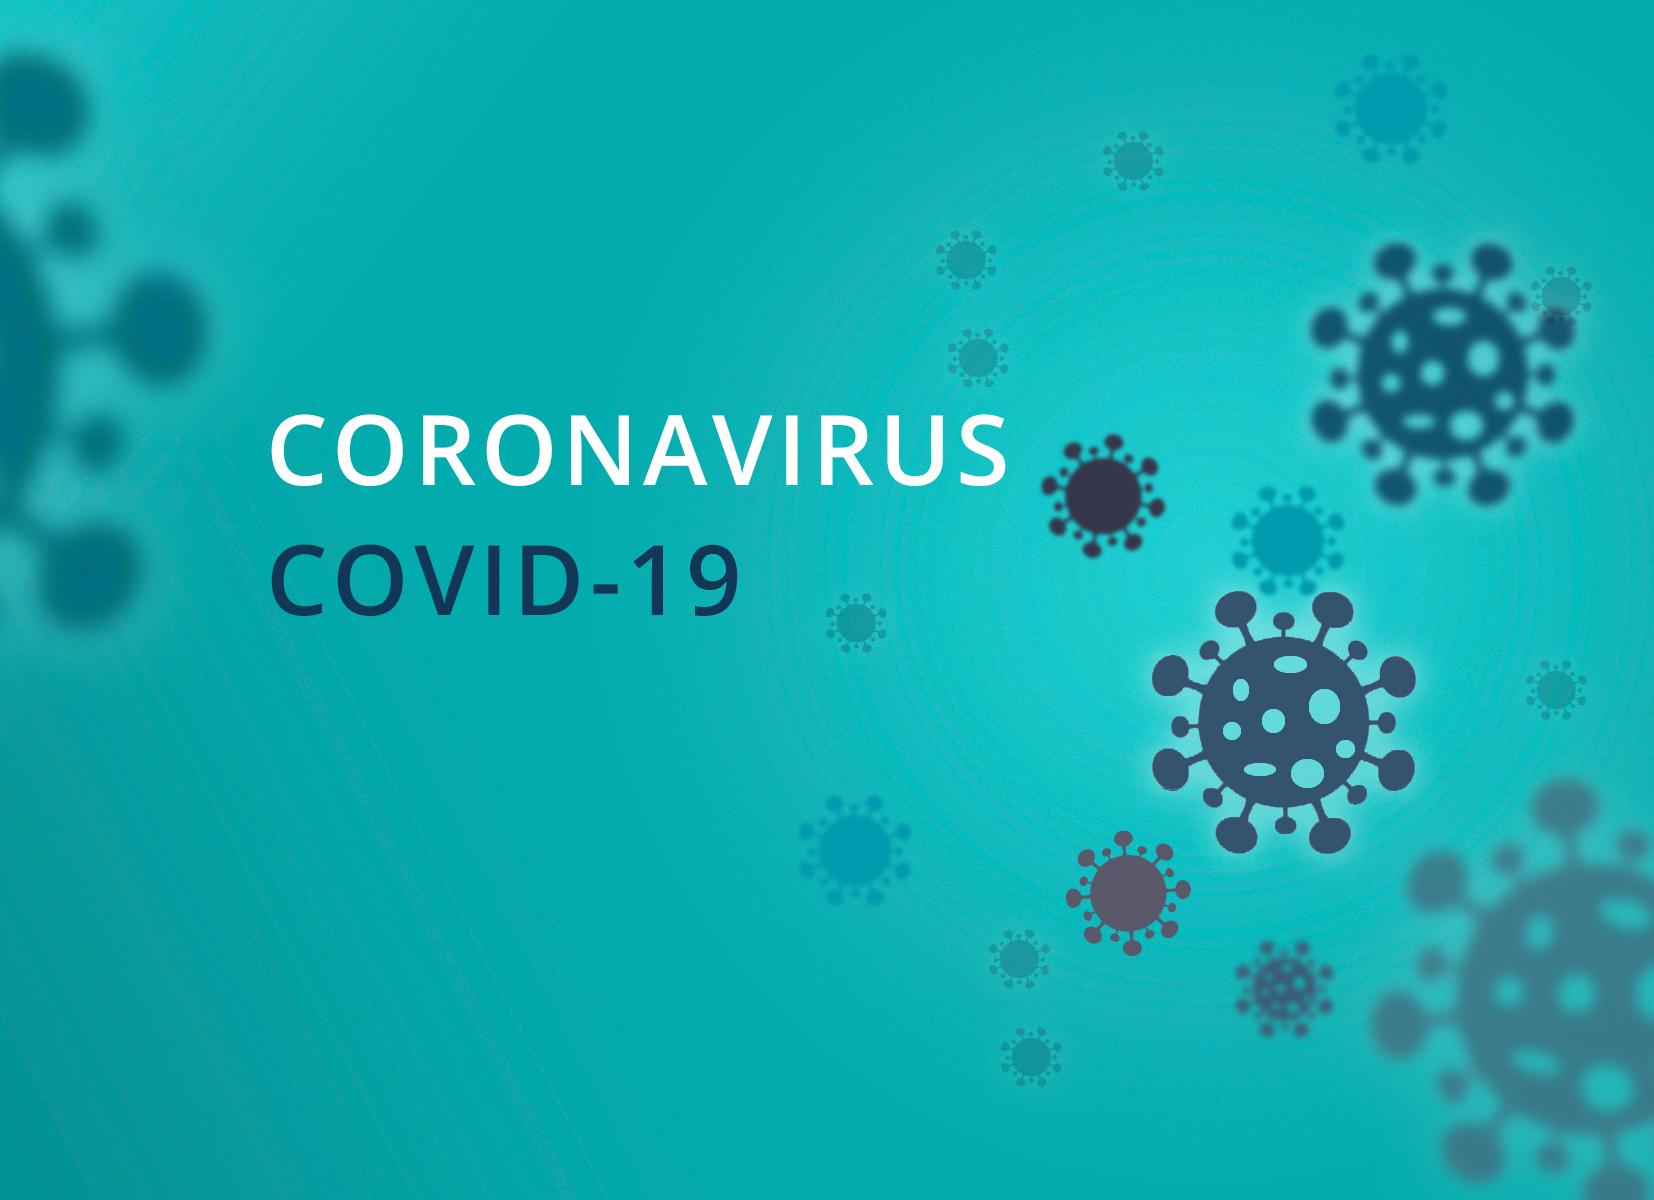 covid-19 coronavirus seamless outbreak background vector illustrator